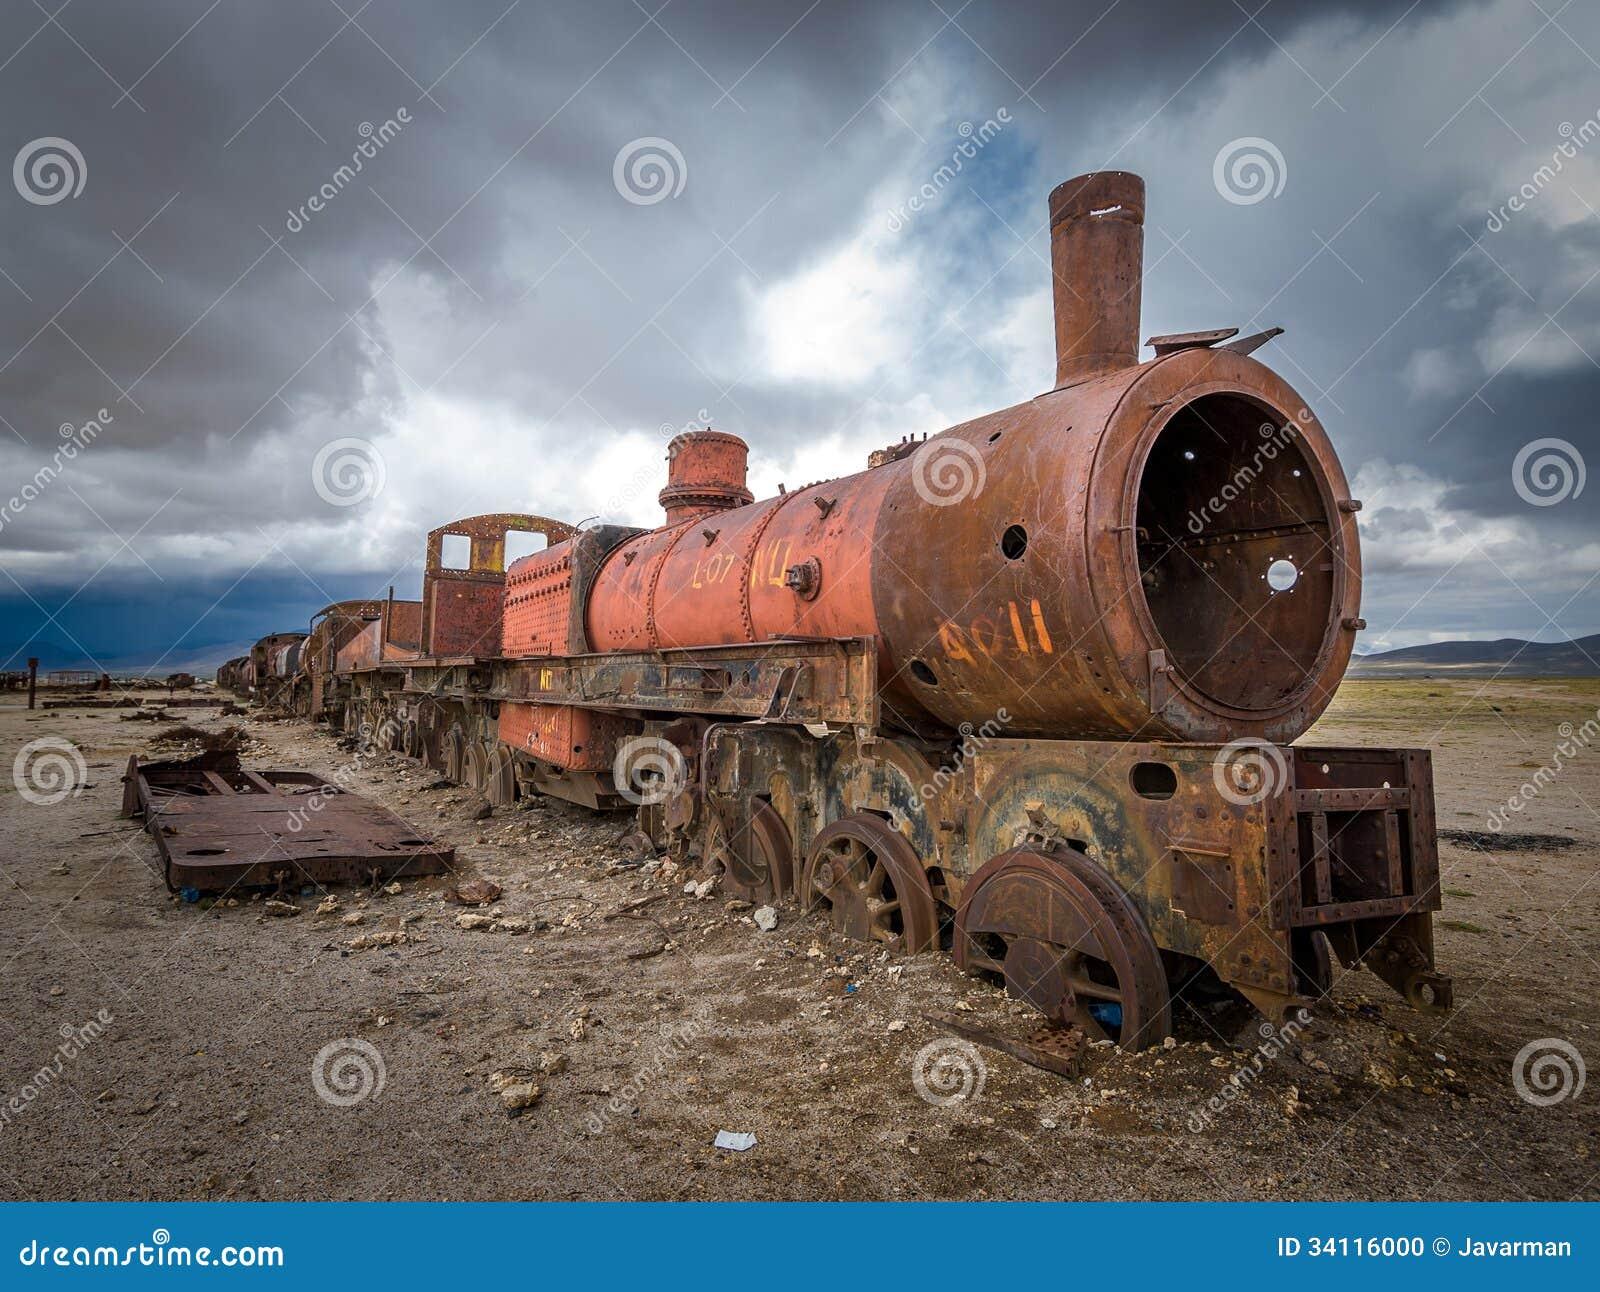 Cimetière de train, Uyuni, Bolivie